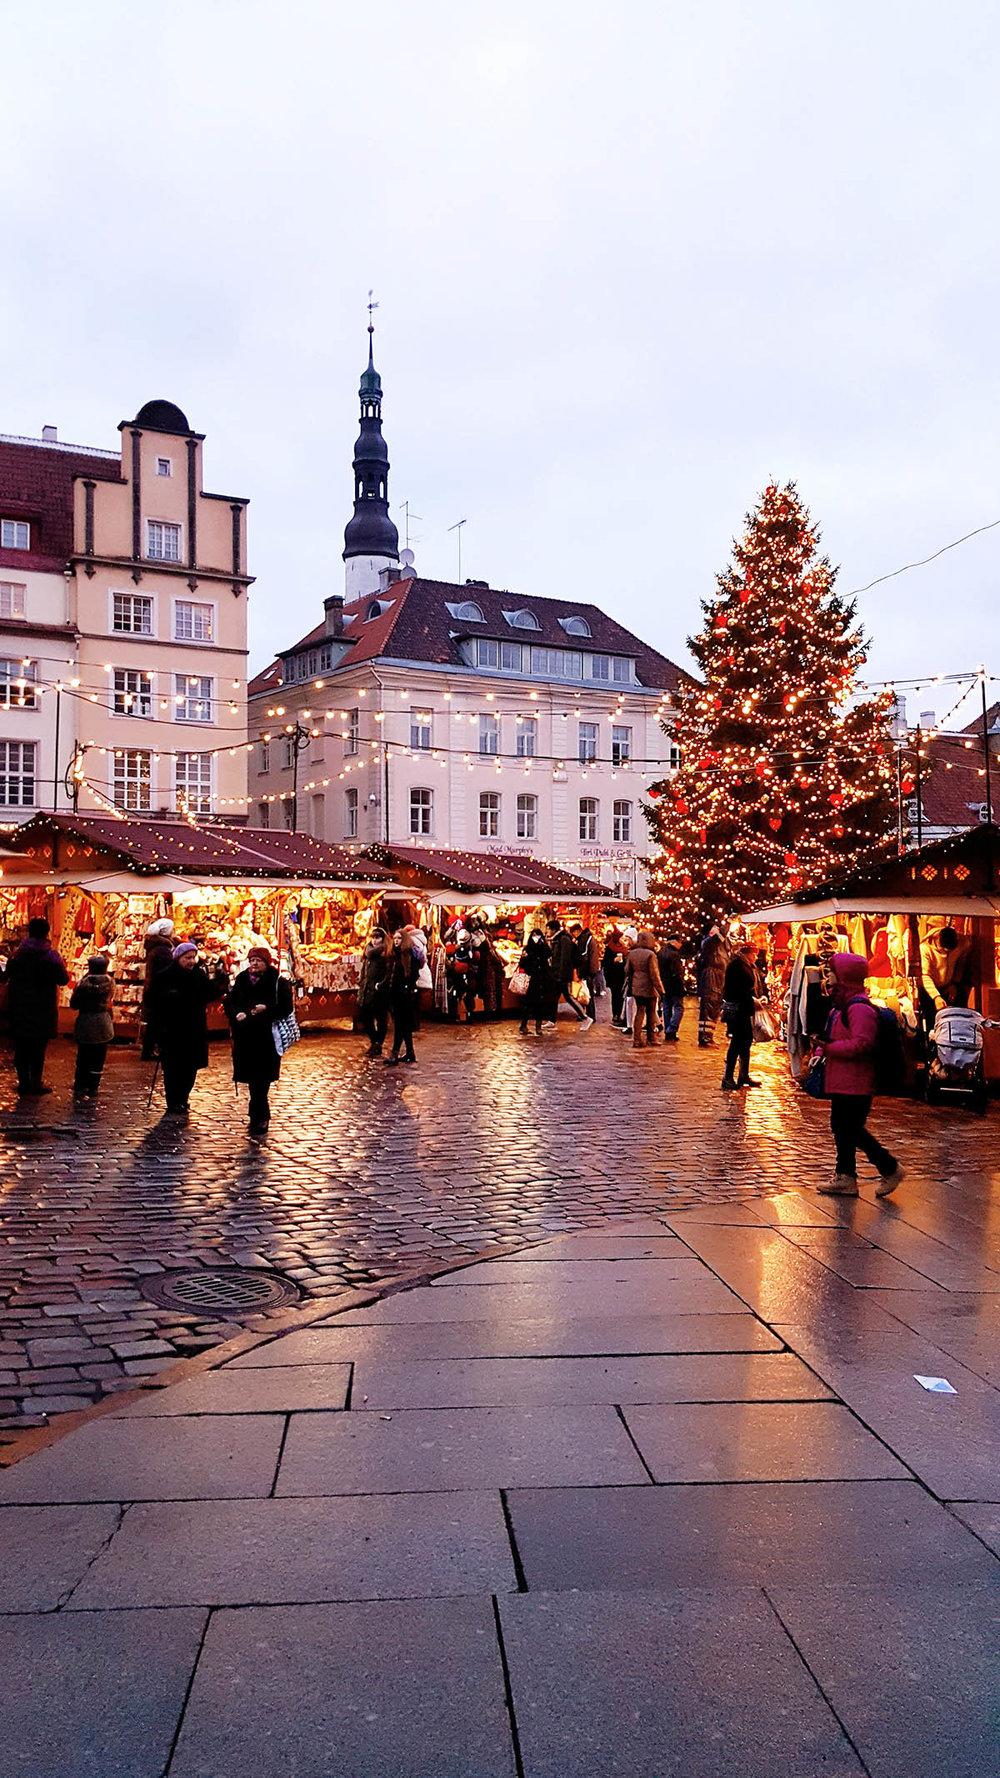 tallinnchristmasmarkets.jpg